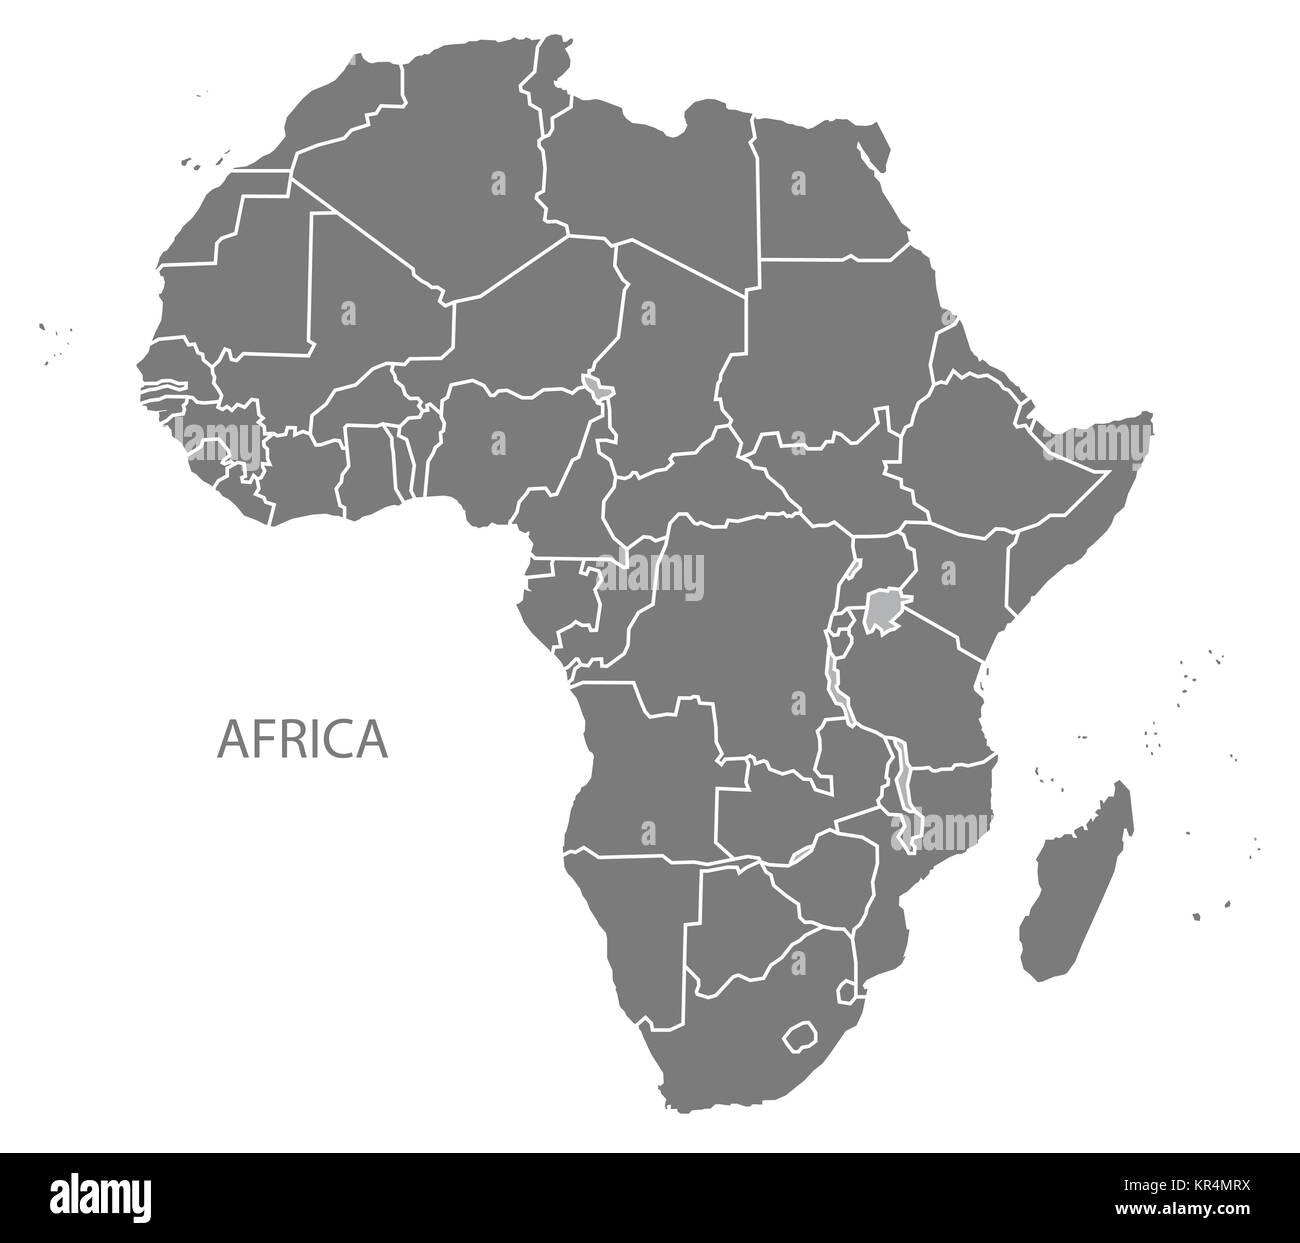 World map flat africa stock photos world map flat africa stock africa map with countries grey stock image gumiabroncs Choice Image